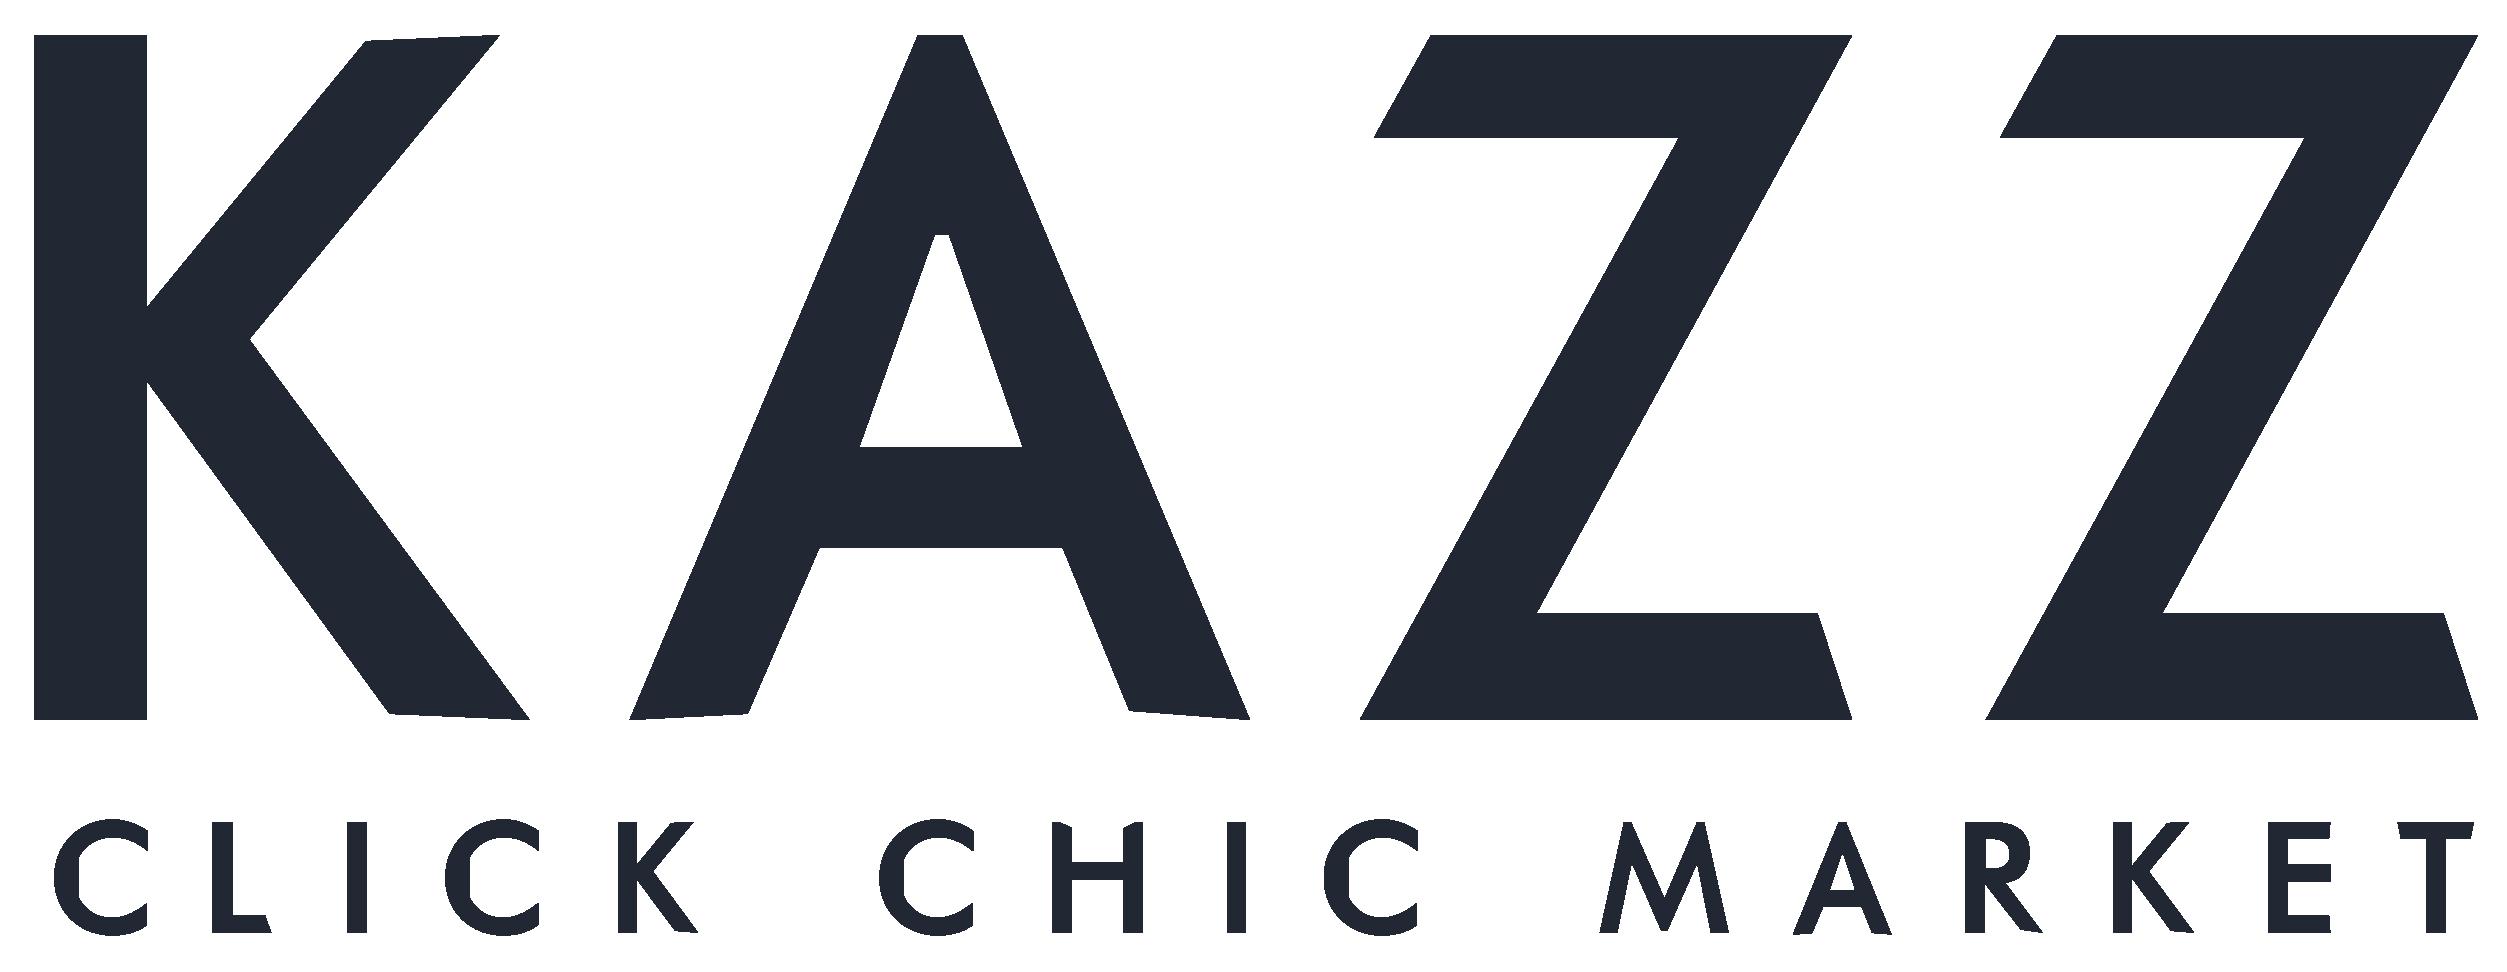 KAZZ MARKET